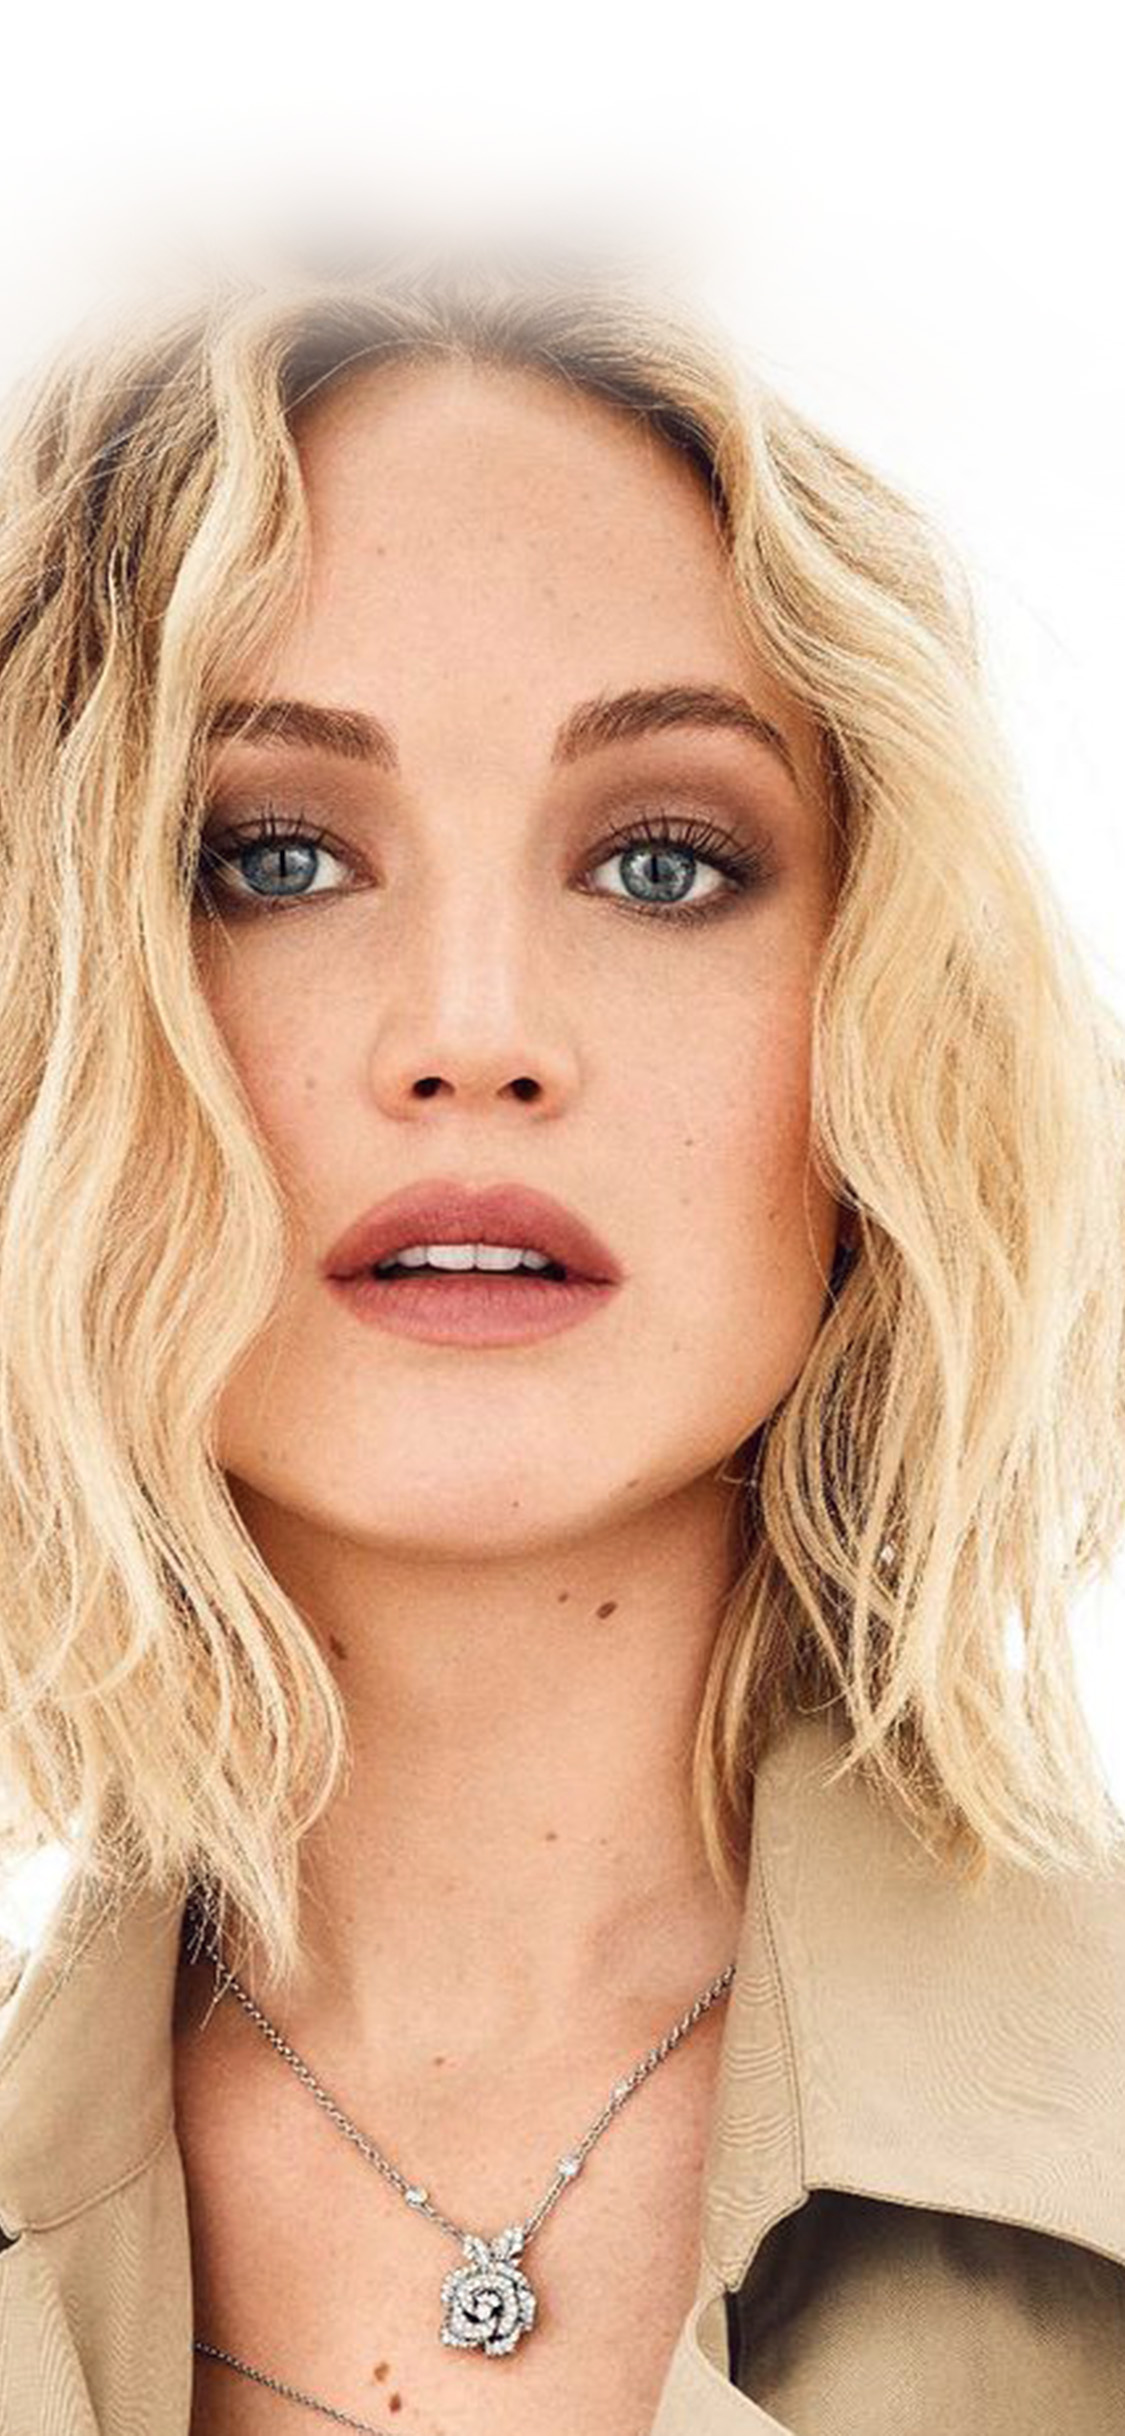 iPhonexpapers.com-Apple-iPhone-wallpaper-hs44-jennifer-lawrence-girl-actress-celebrity-film